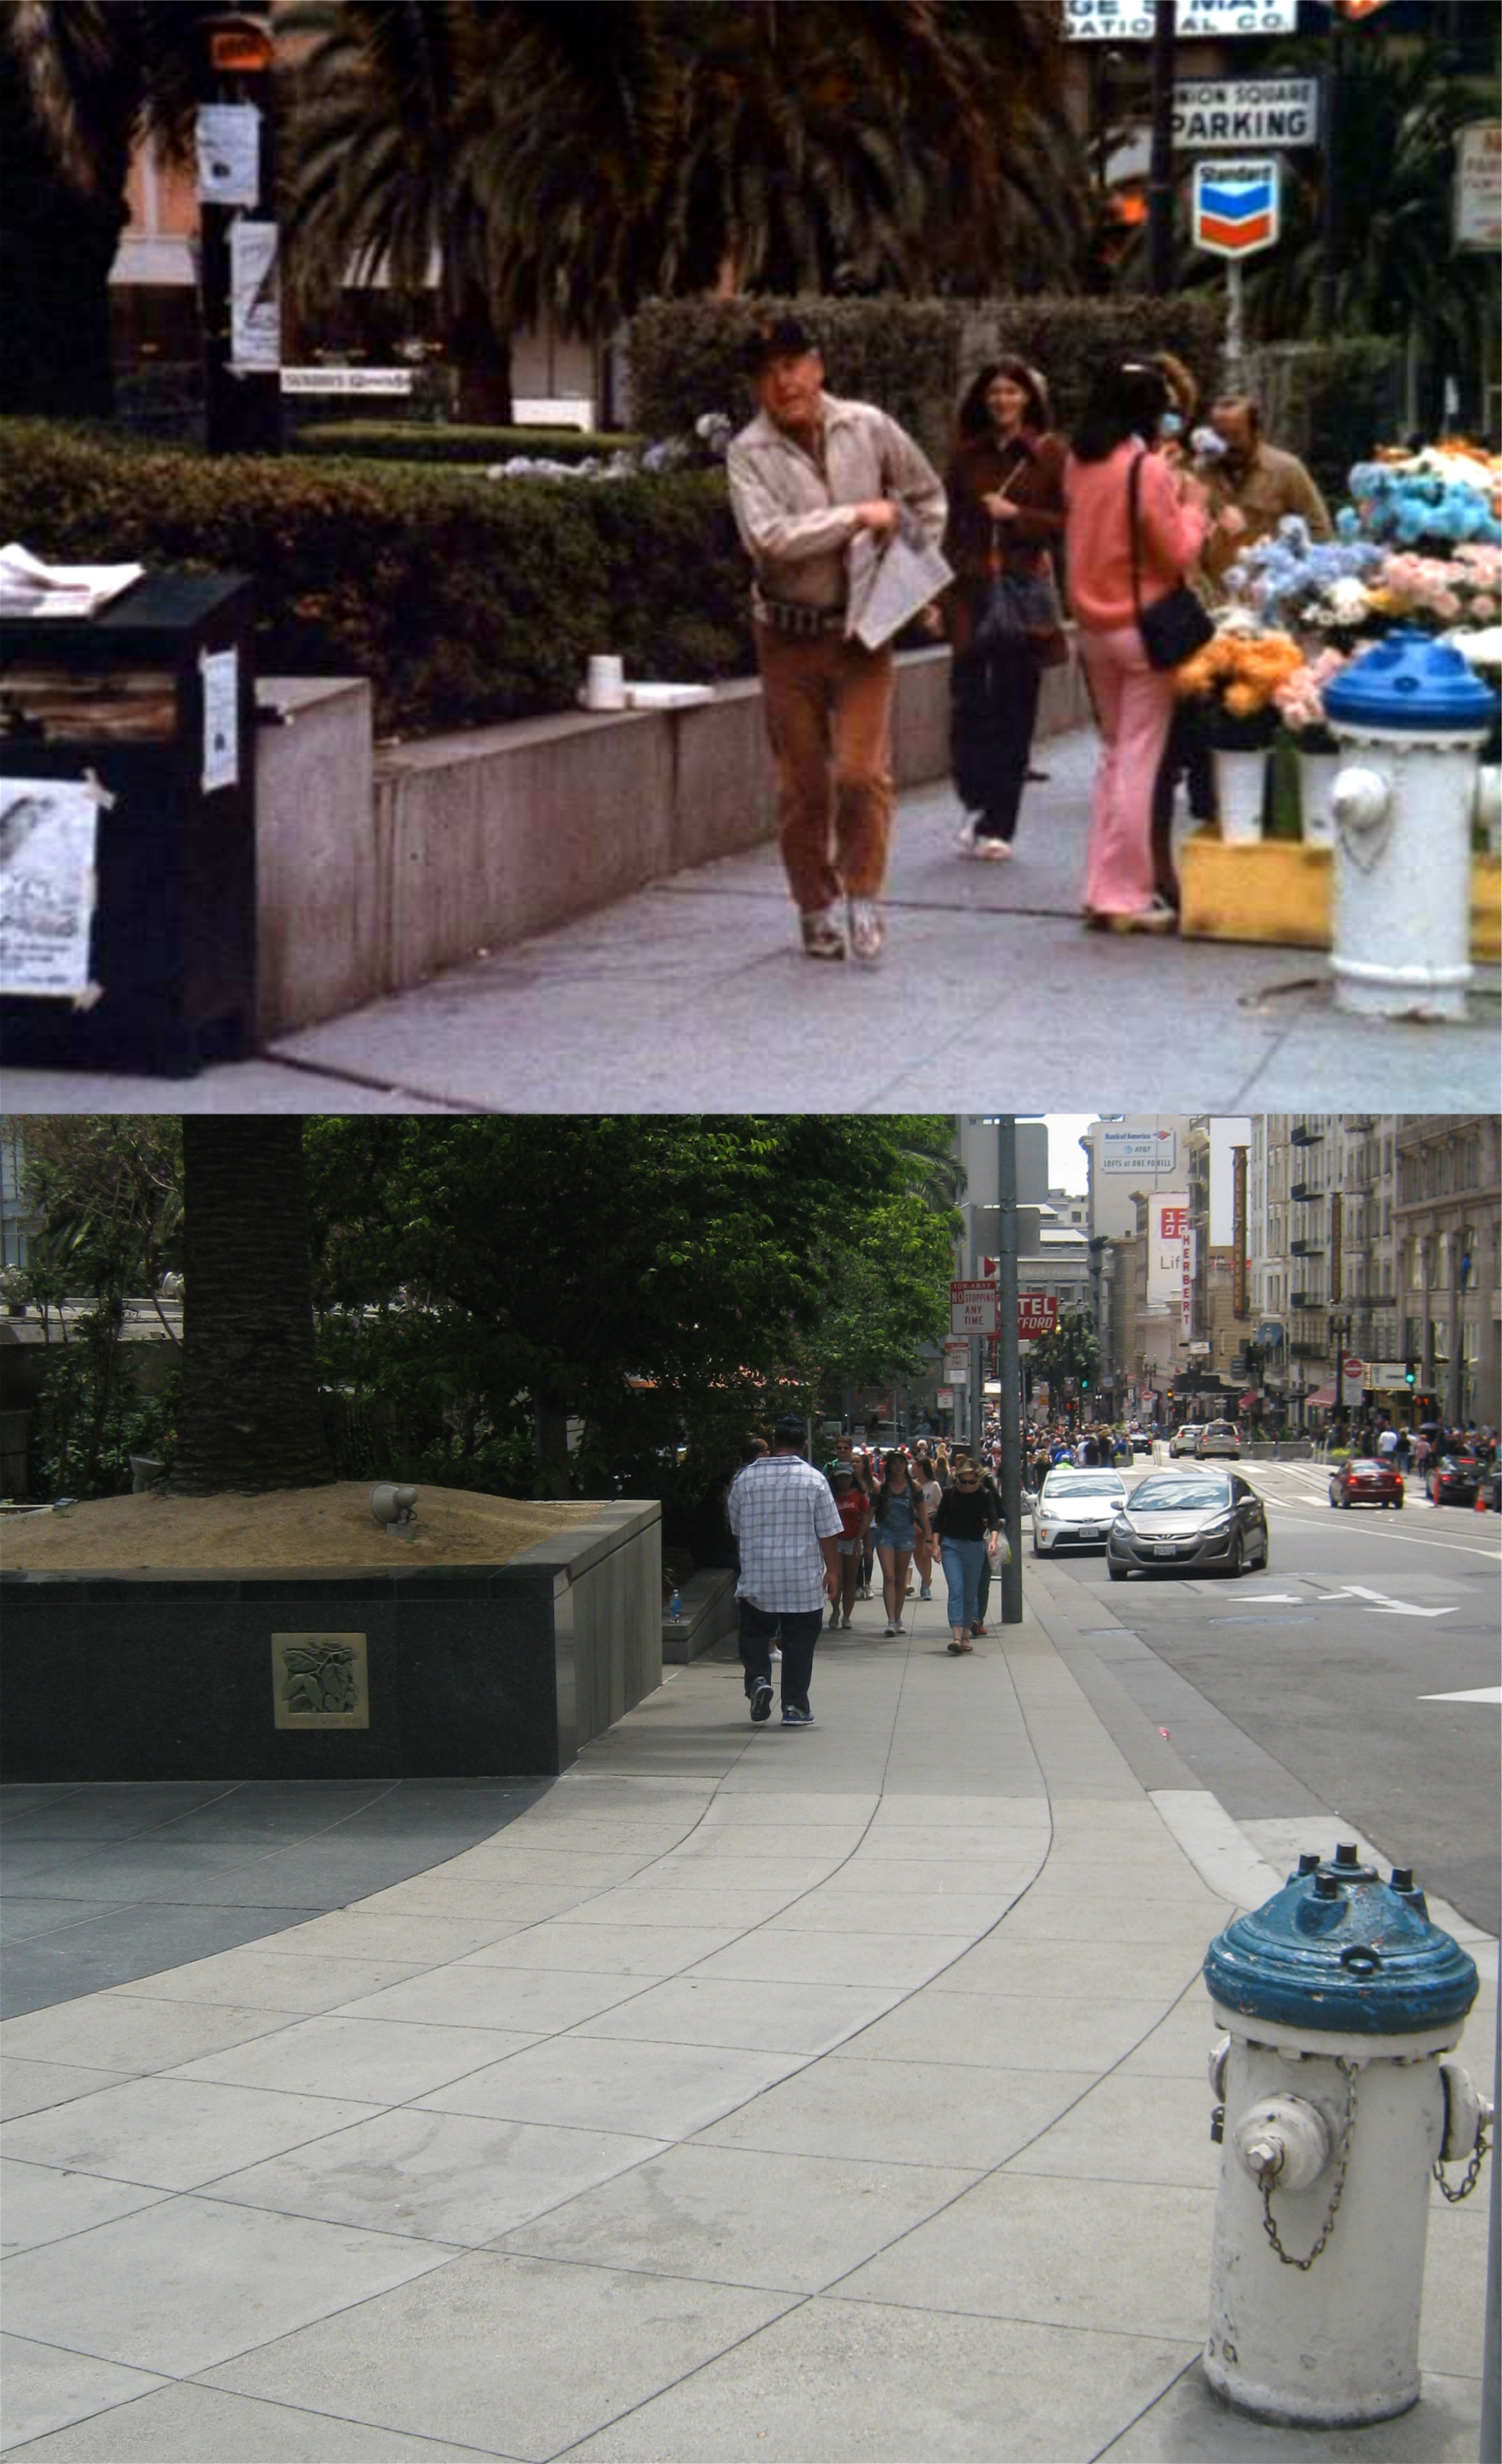 Streetsnewsman1use